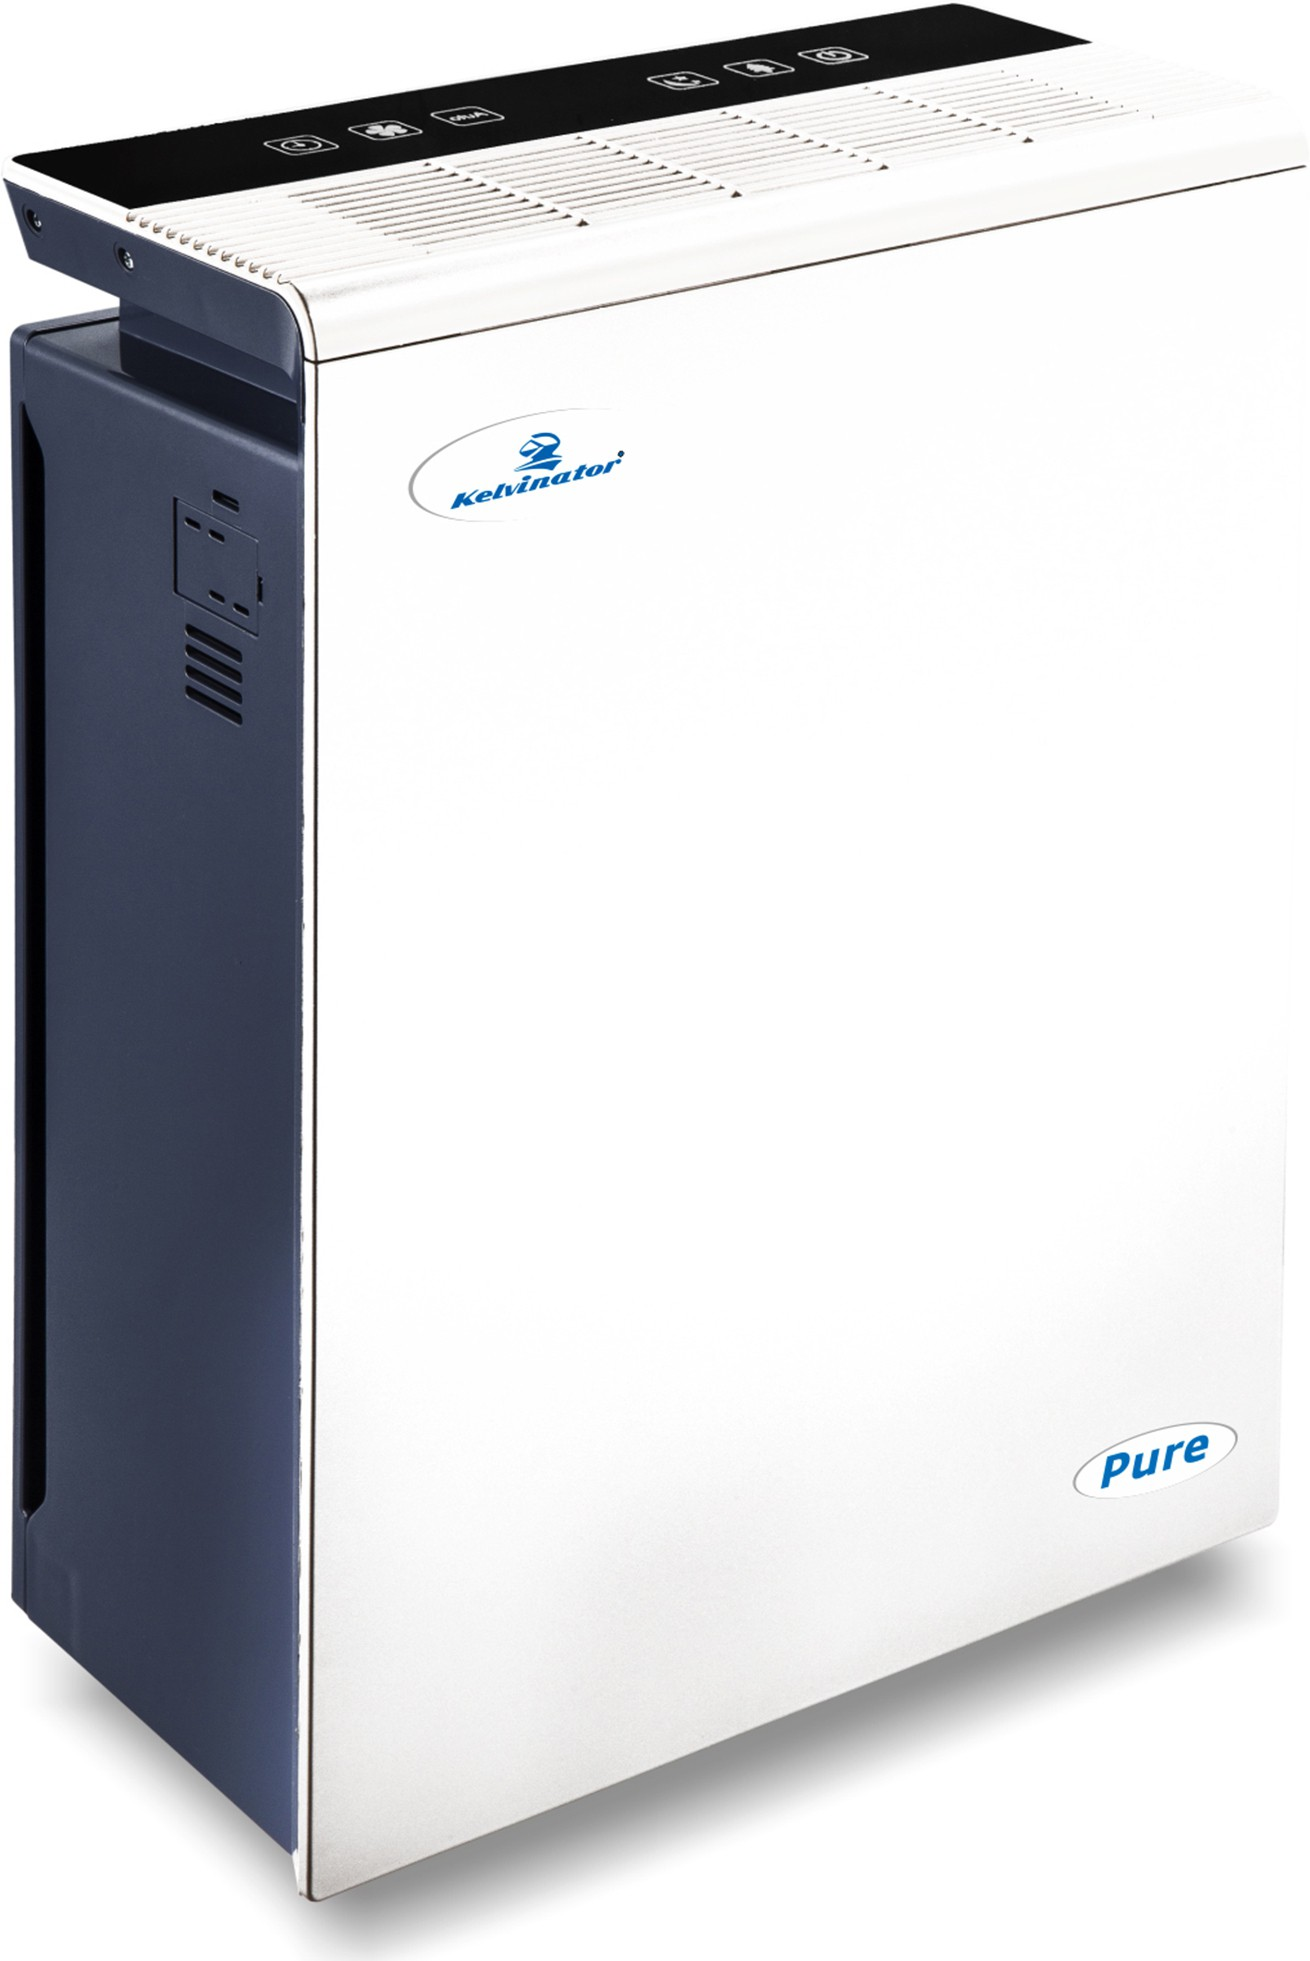 View Kelvinator Kelvinator Pure Air Purifier Portable Room Air Purifier(White) Home Appliances Price Online(Kelvinator)